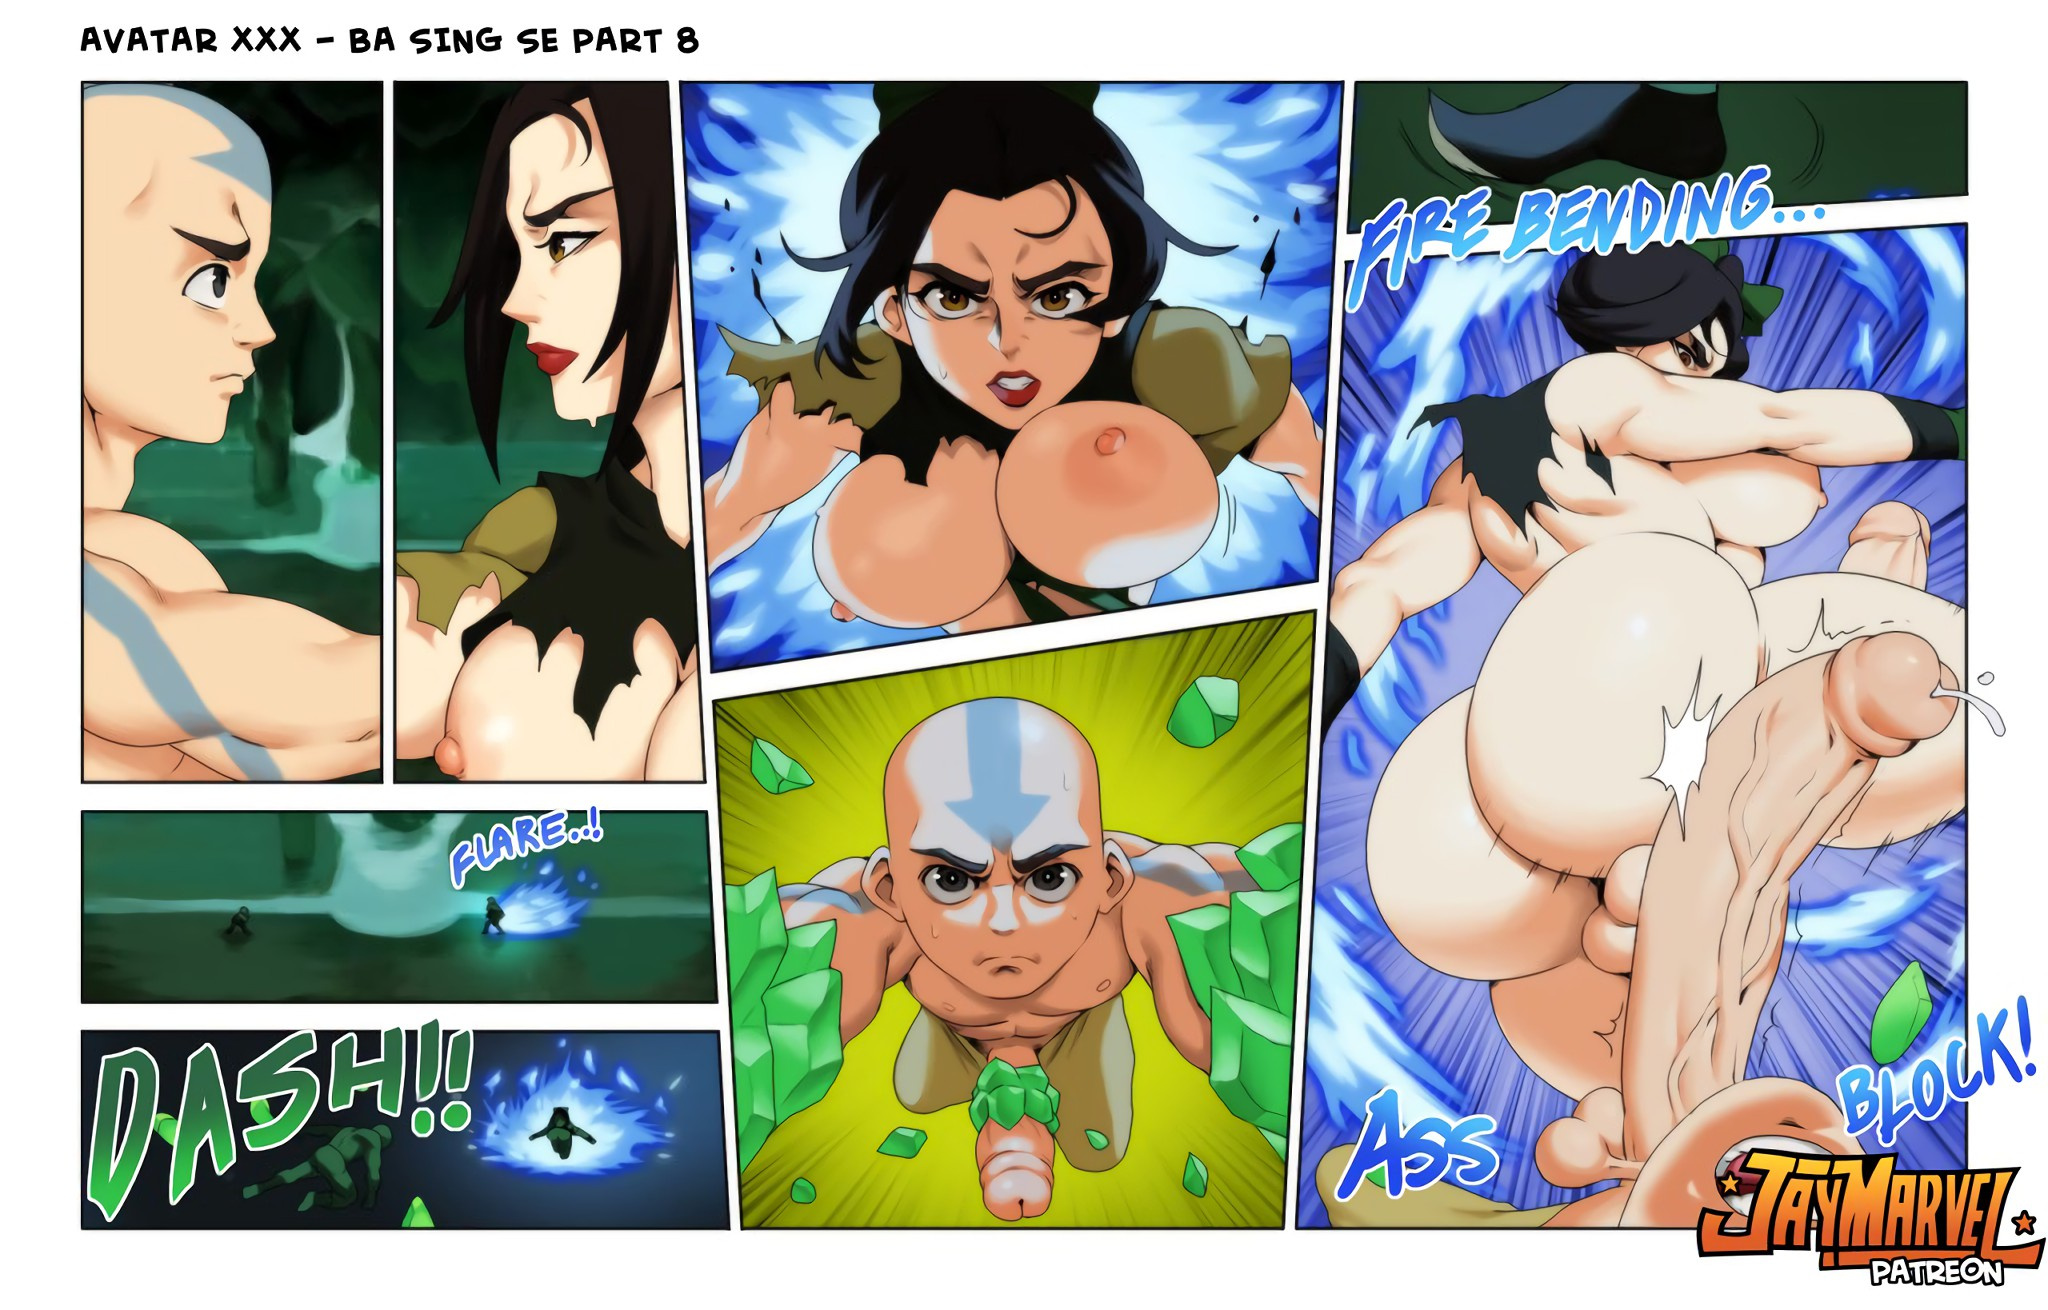 Avatar XXX Book Two porn comics Oral sex, Big Tits, Blowjob, Creampie, Cum Shots, Cum Swallow, Deepthroat, Deformed, Double Penetration, Fantasy, Futanari, Straight, Straight Shota, Titfuck